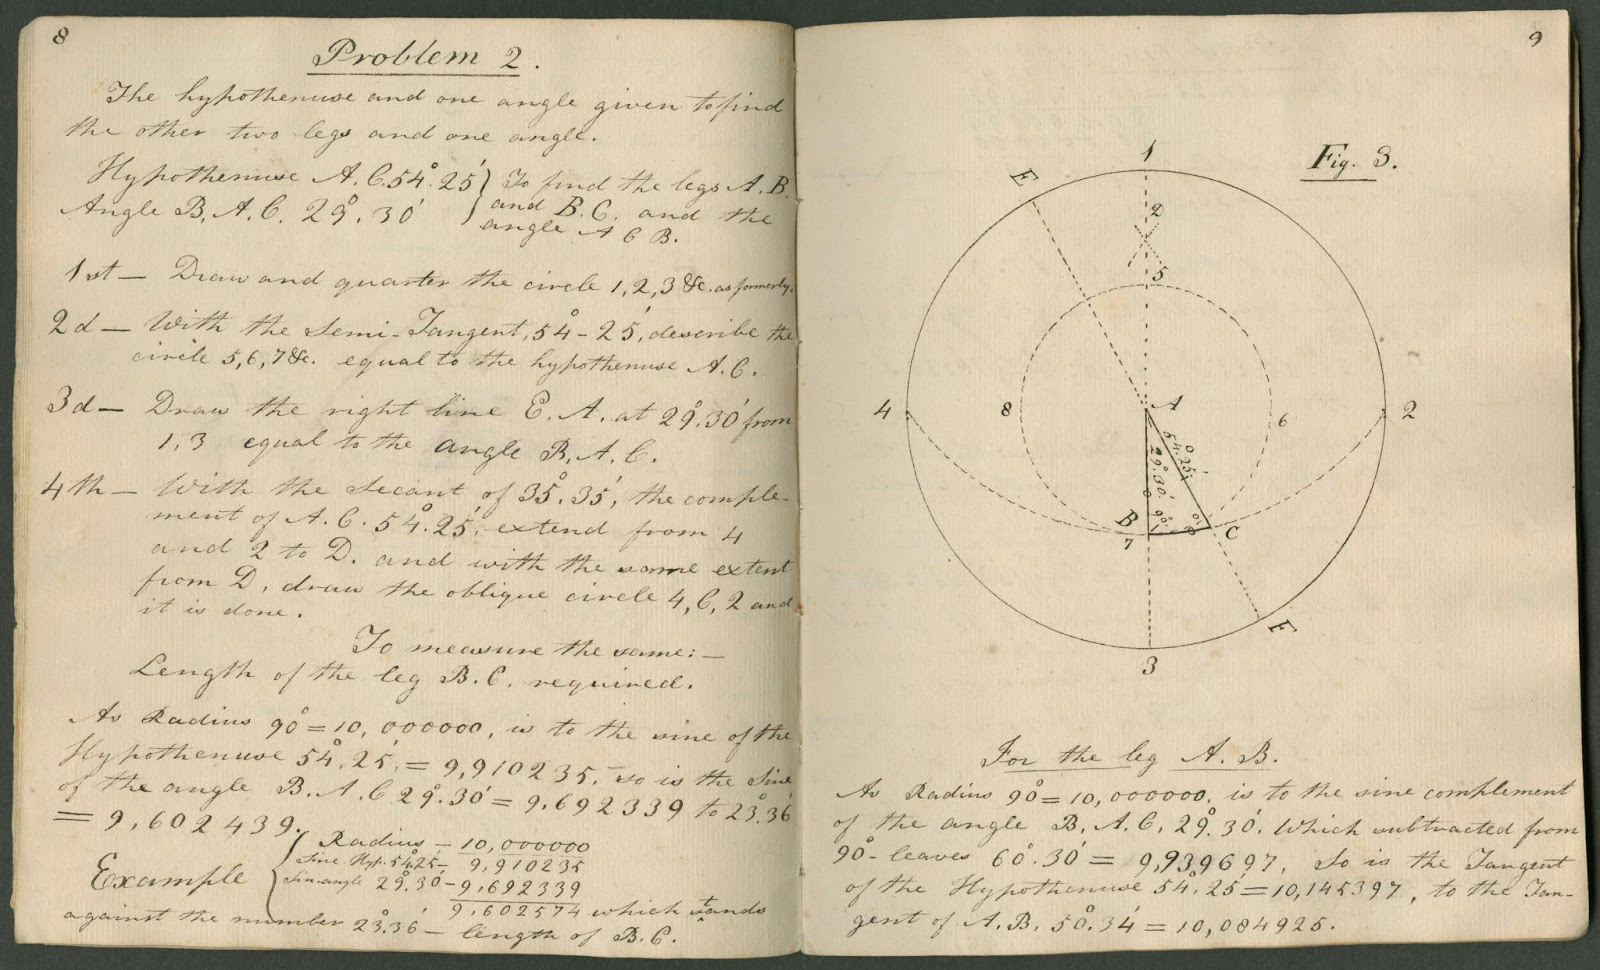 An open book of handwritten text and geometric figures.